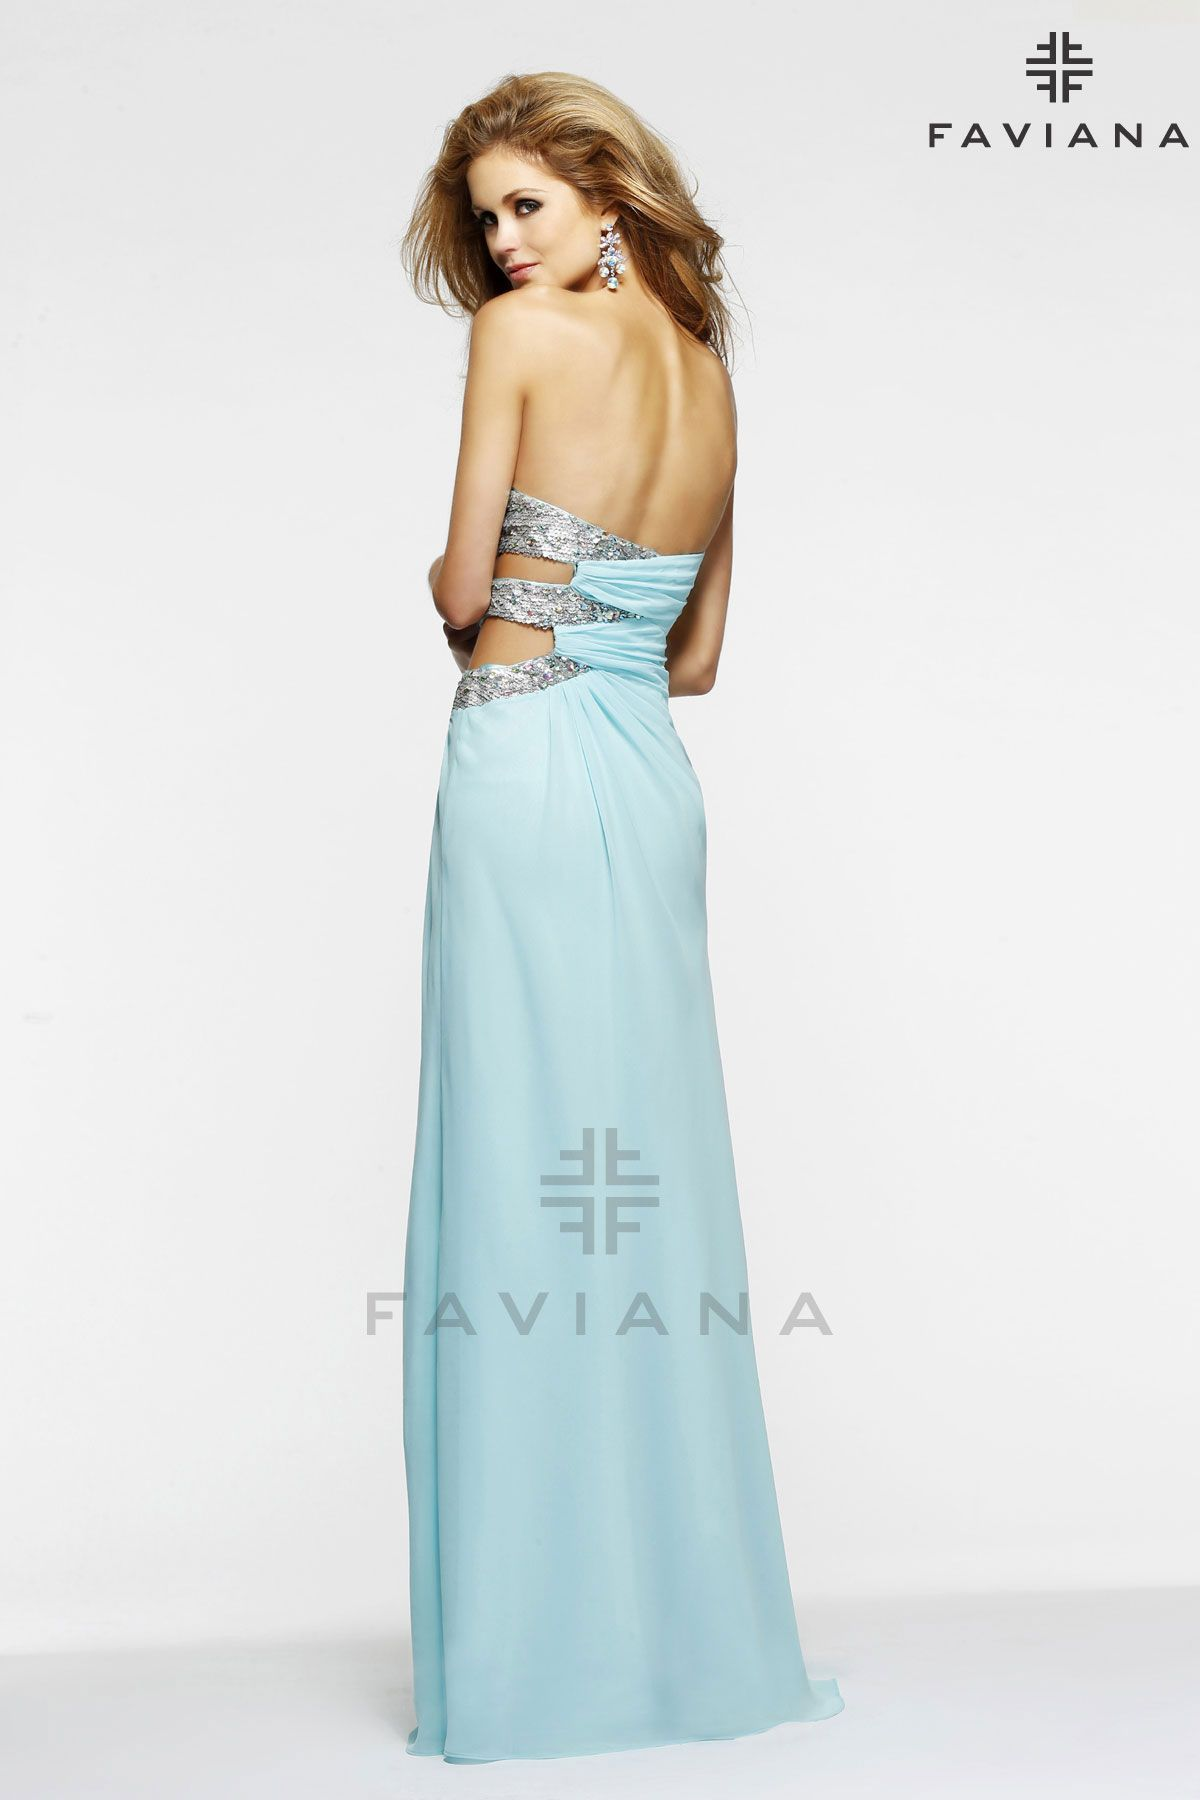 Hannah\'s Boutique Chicago | Faviana Prom Dresses 7304 ...